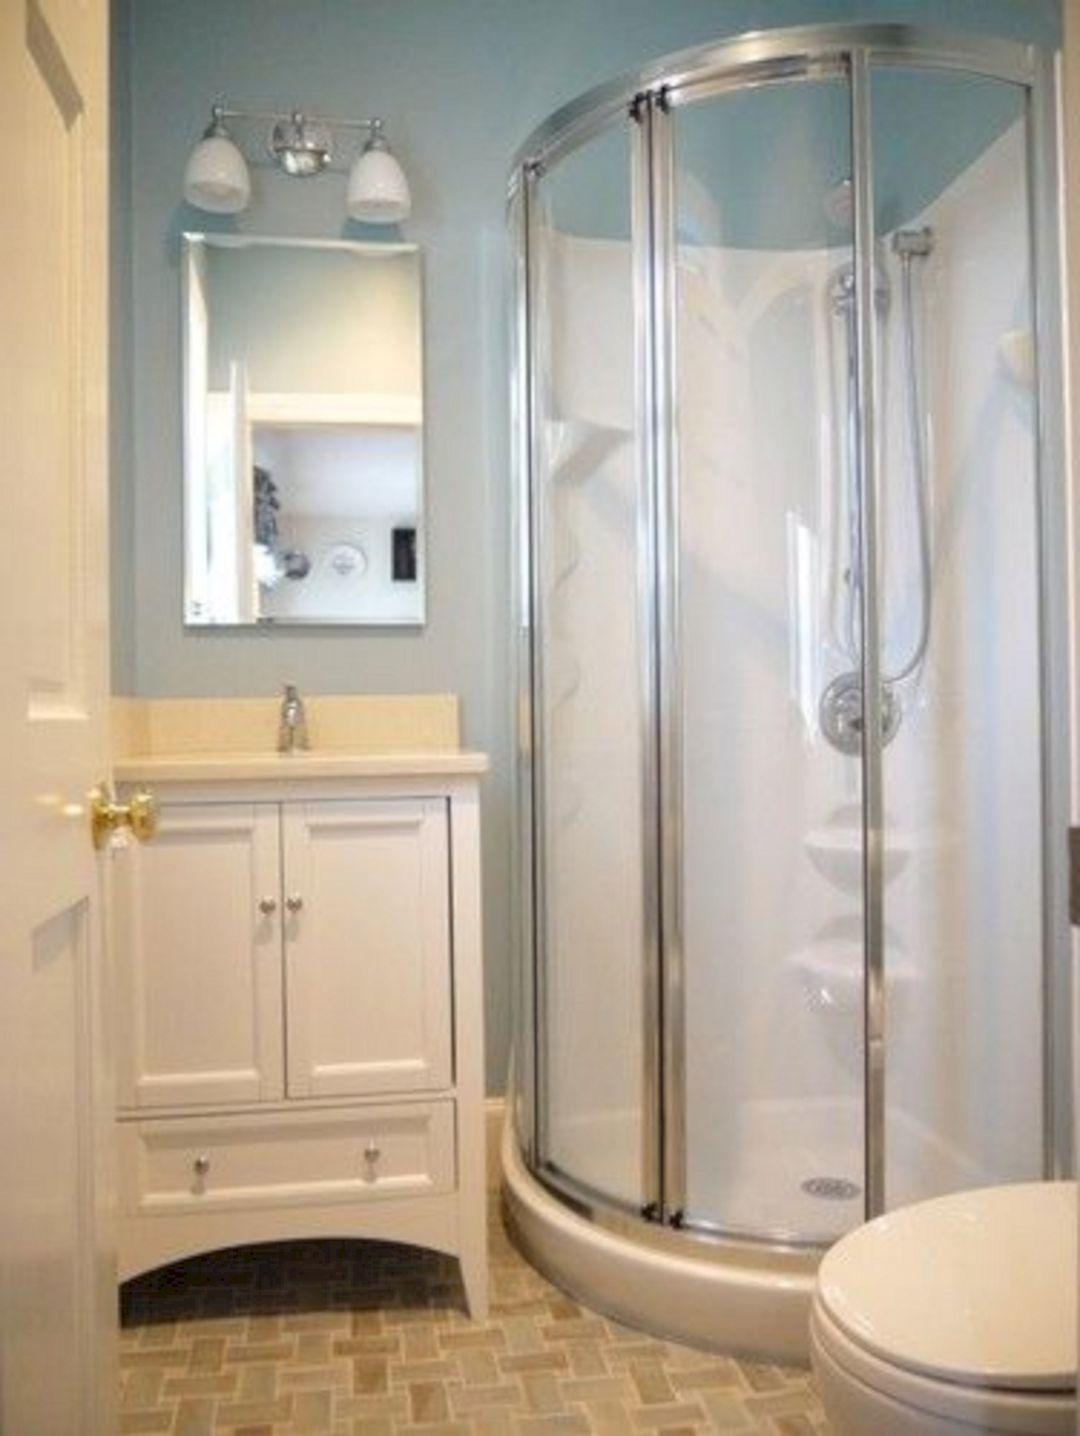 11 Delectable Half Bathroom Remodel Pallet Walls Ideas Bathroom Delectable Ideas Pallet Remodel In 2020 Small Basement Bathroom Tiny House Bathroom Shower Remodel